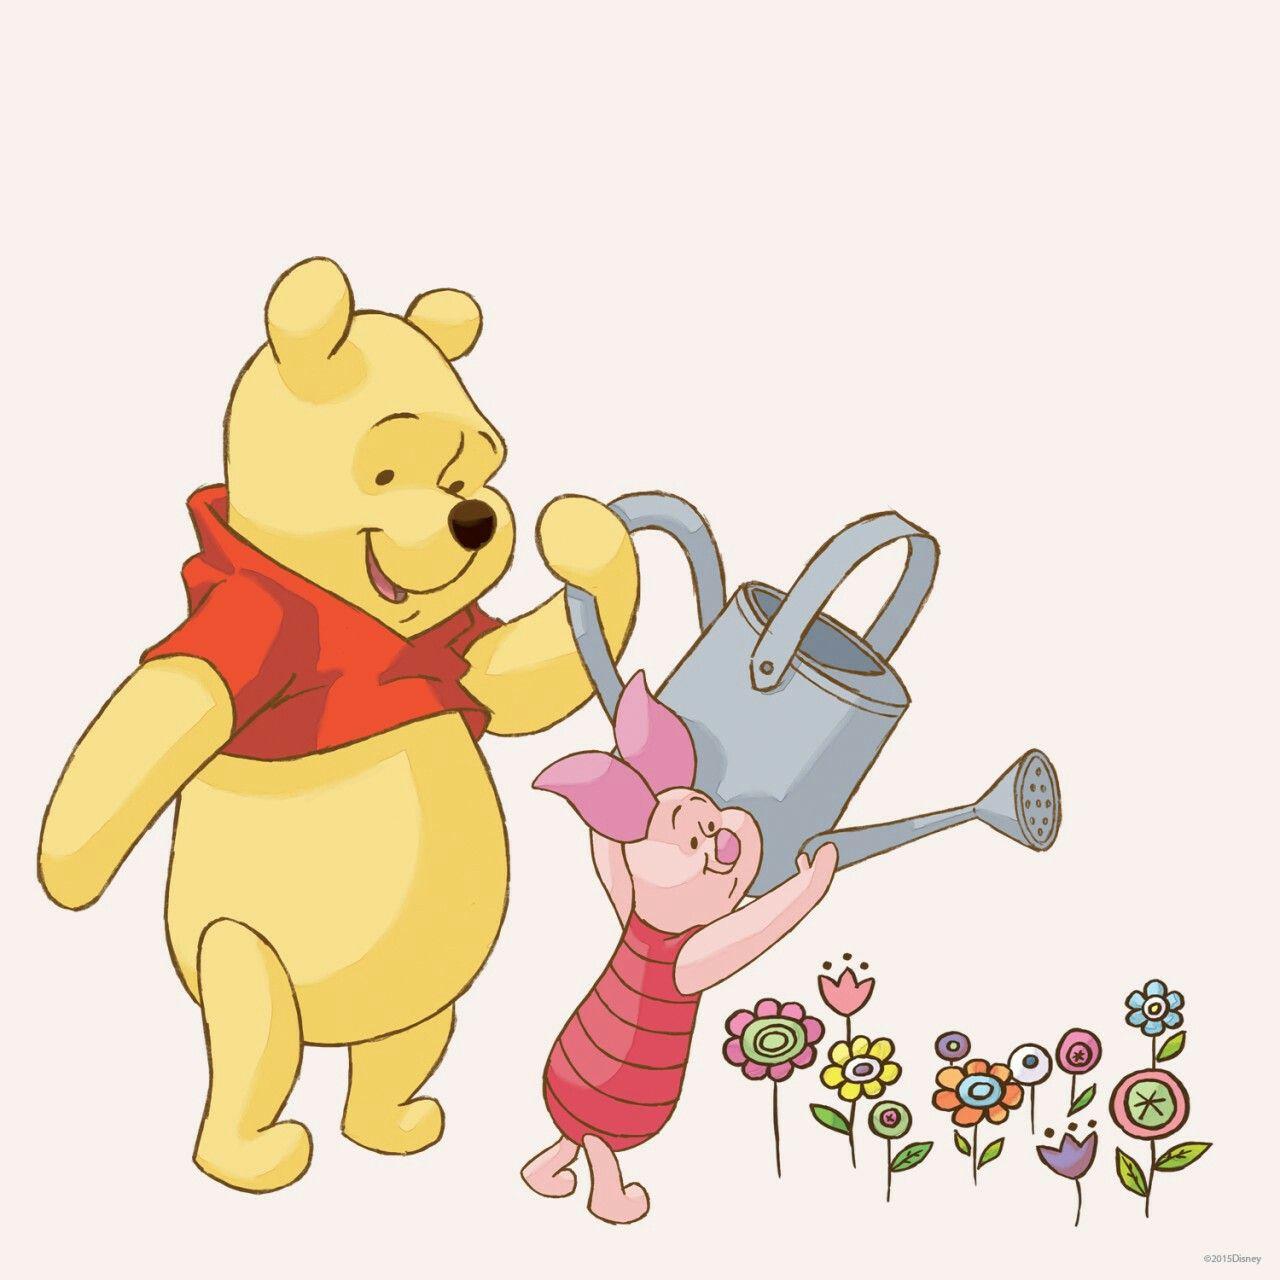 Winnie The Pooh Winnie The Pooh Winnie The Pooh Friends Pooh Bear